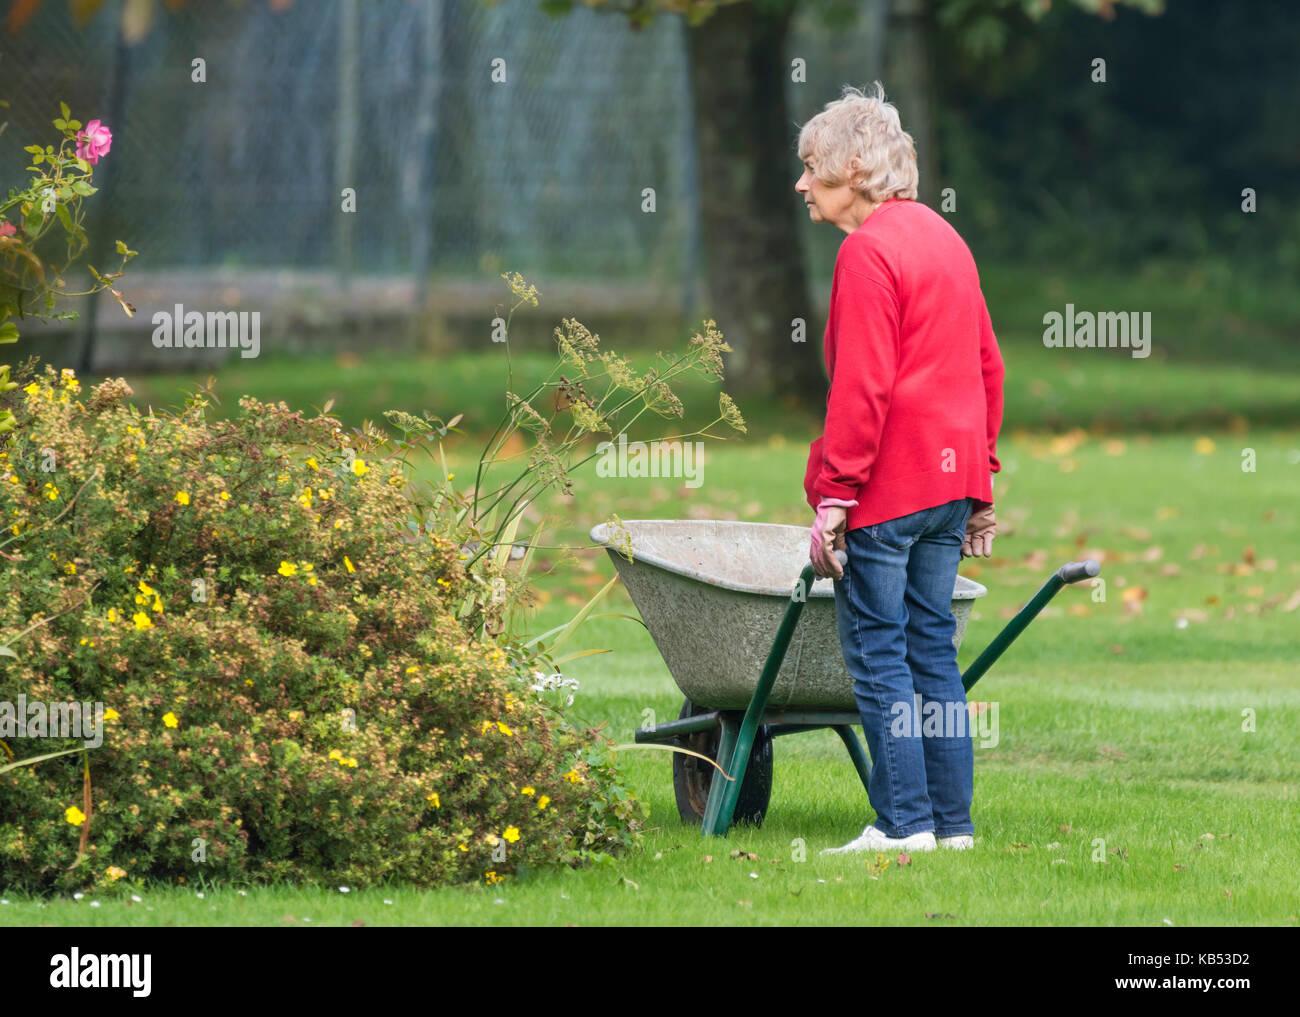 Elderly female gardener pushing a wheelbarrow. Old lady gardening senior. - Stock Image